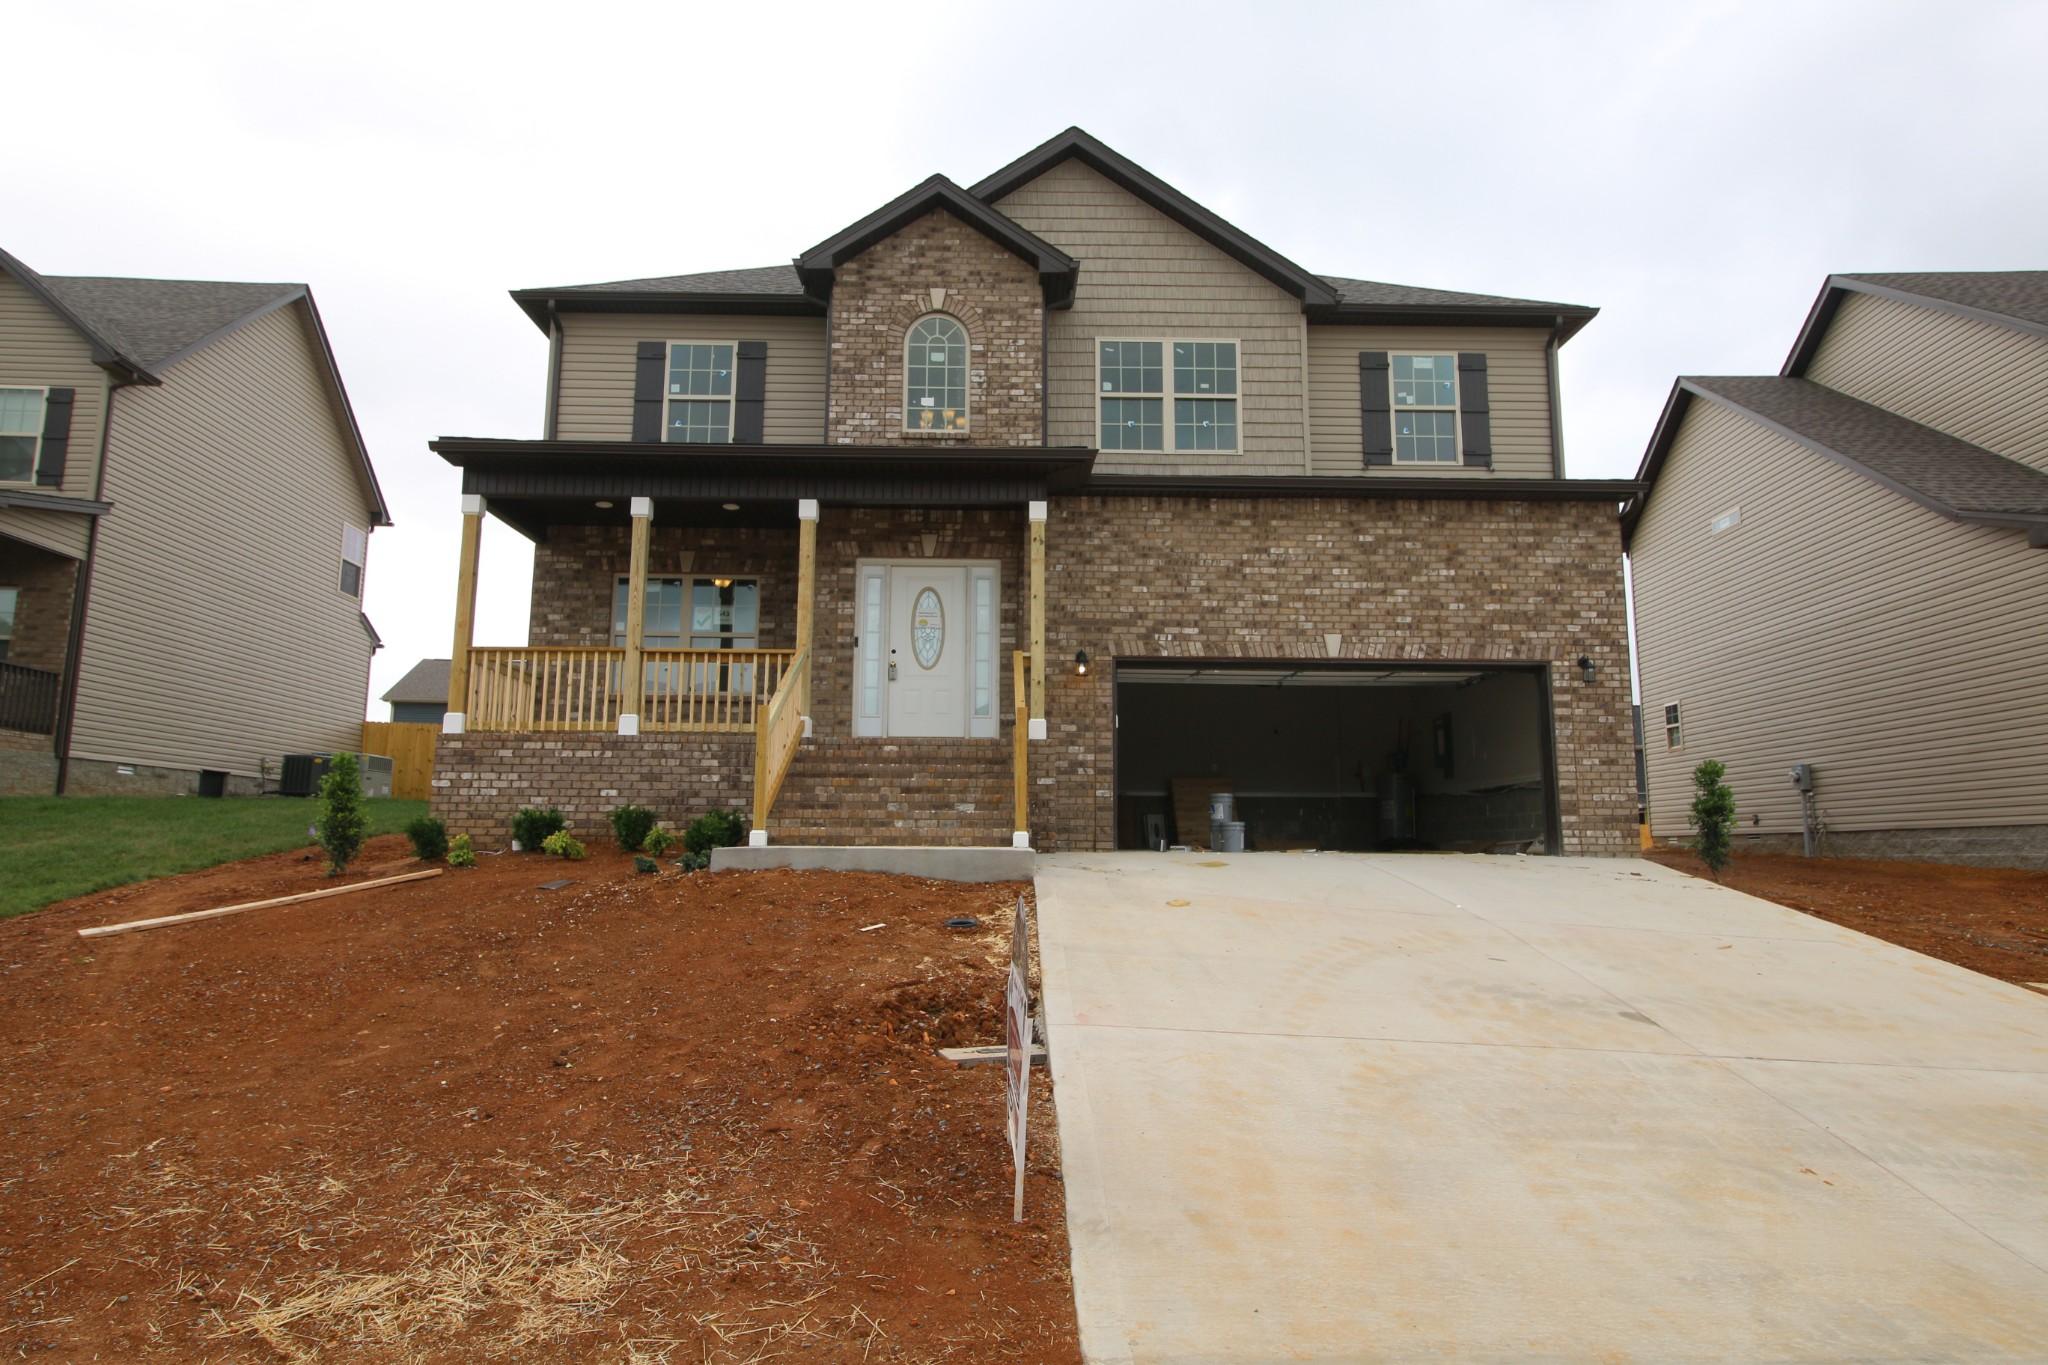 543 Autumn Creek Property Photo - Clarksville, TN real estate listing